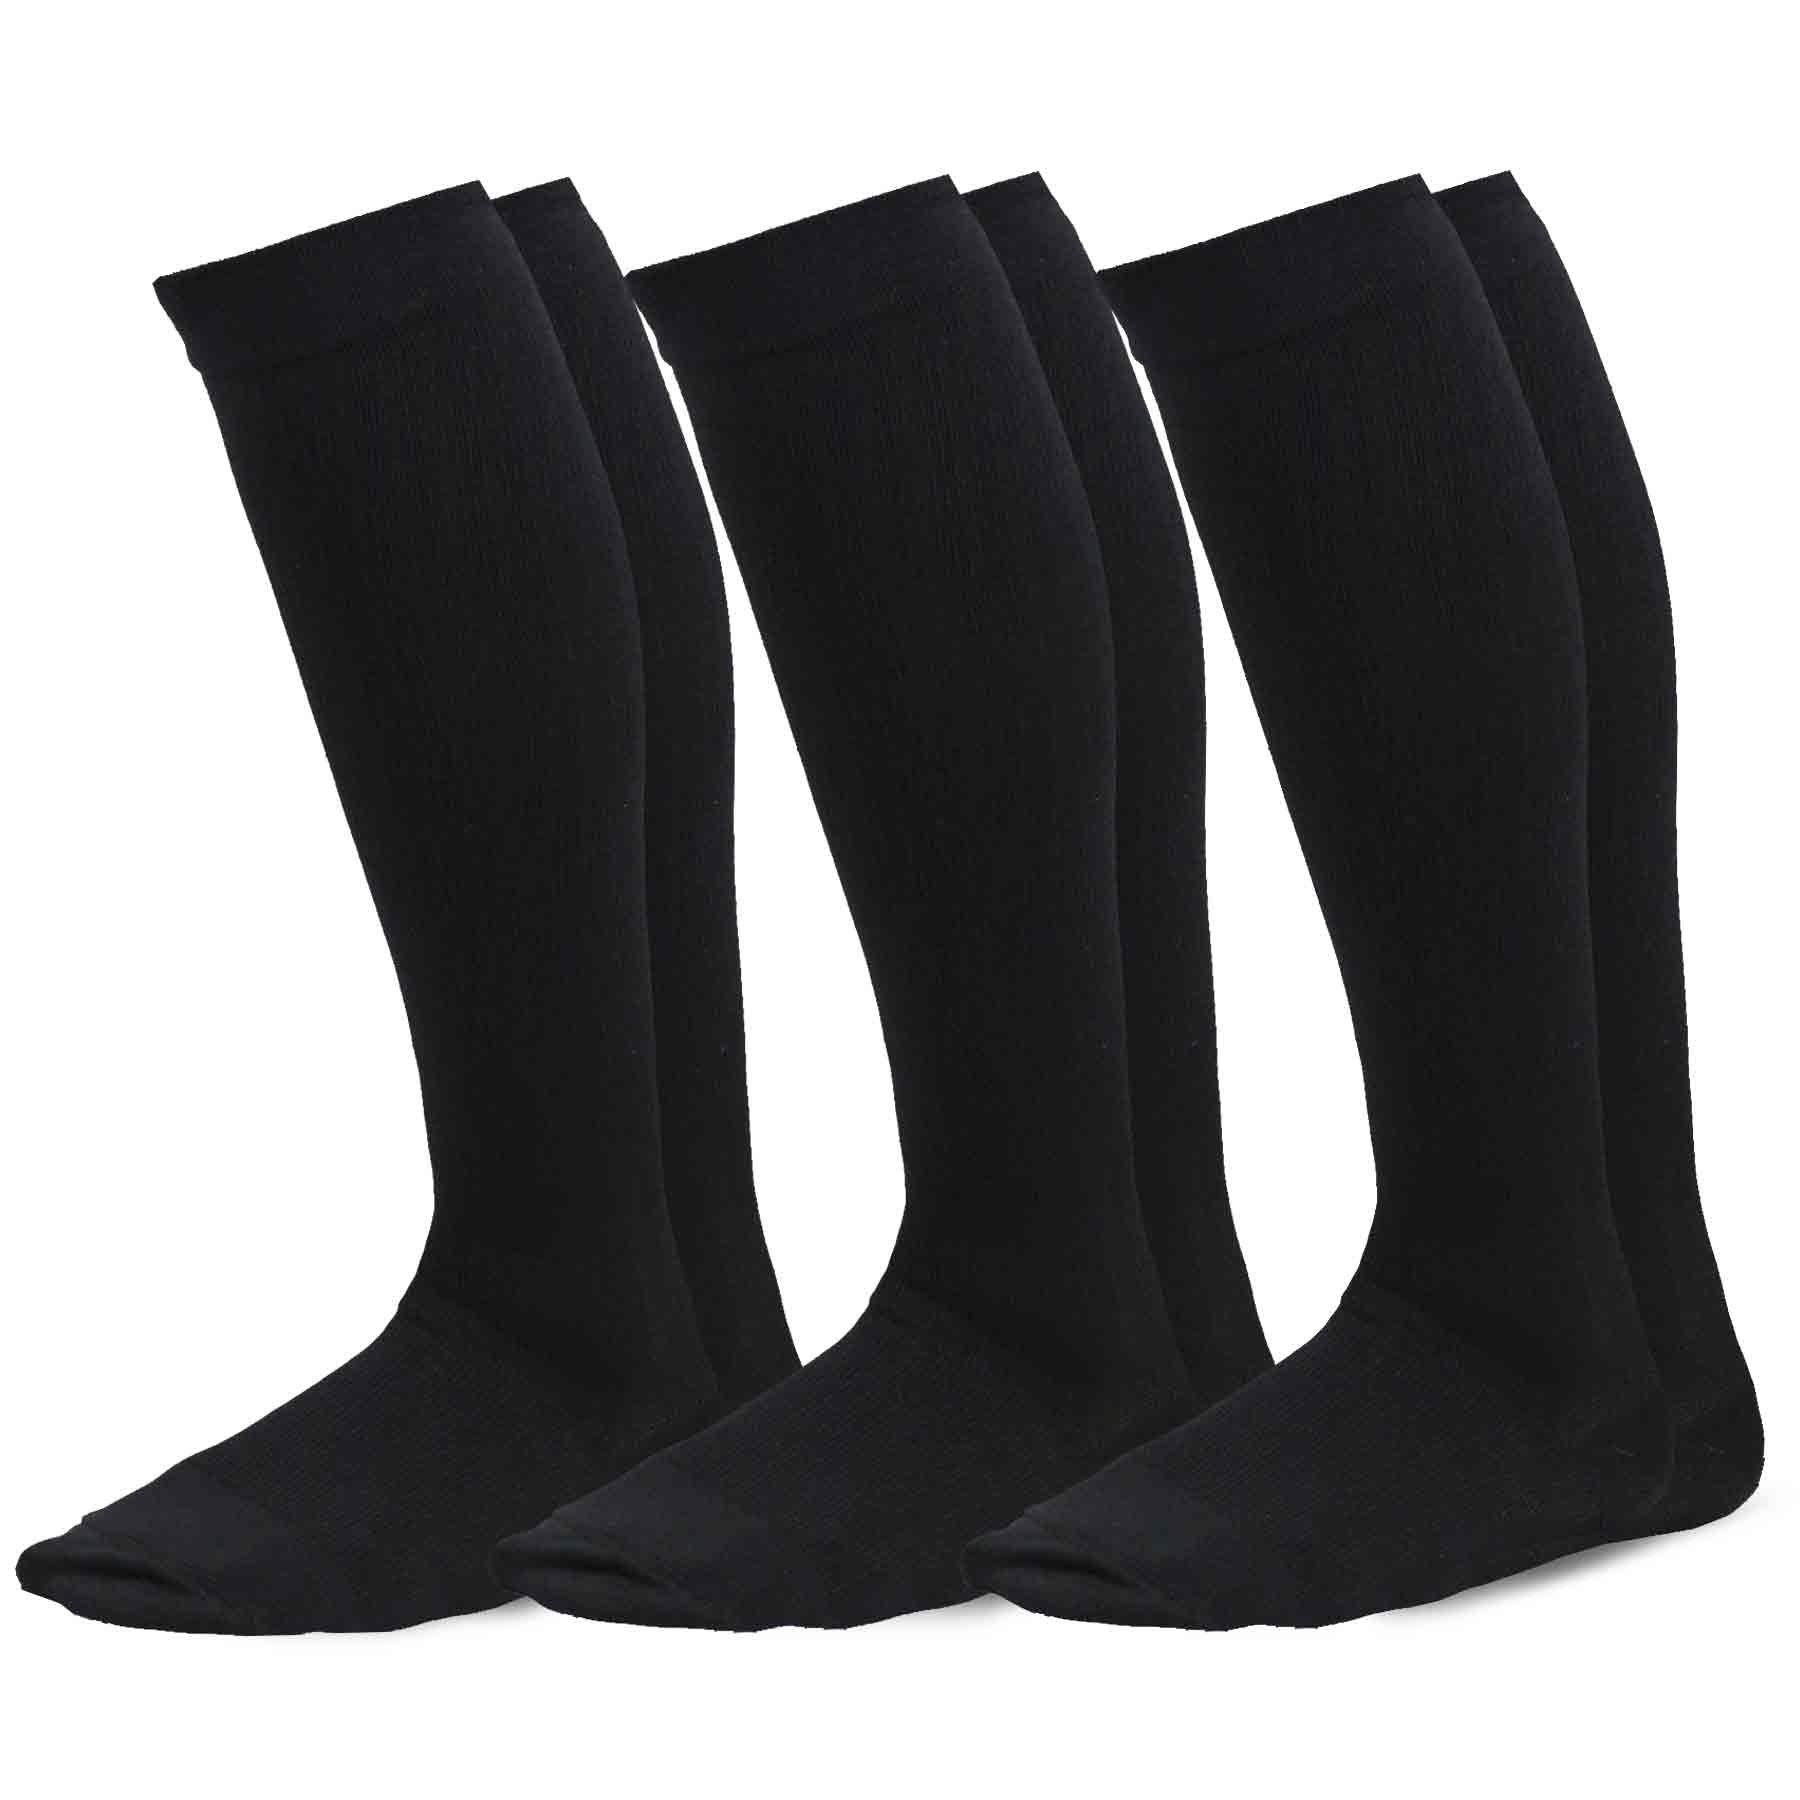 TeeHee Microfiber Compression Knee High Socks with Rib 3-Pack (Small (8-9), Black)